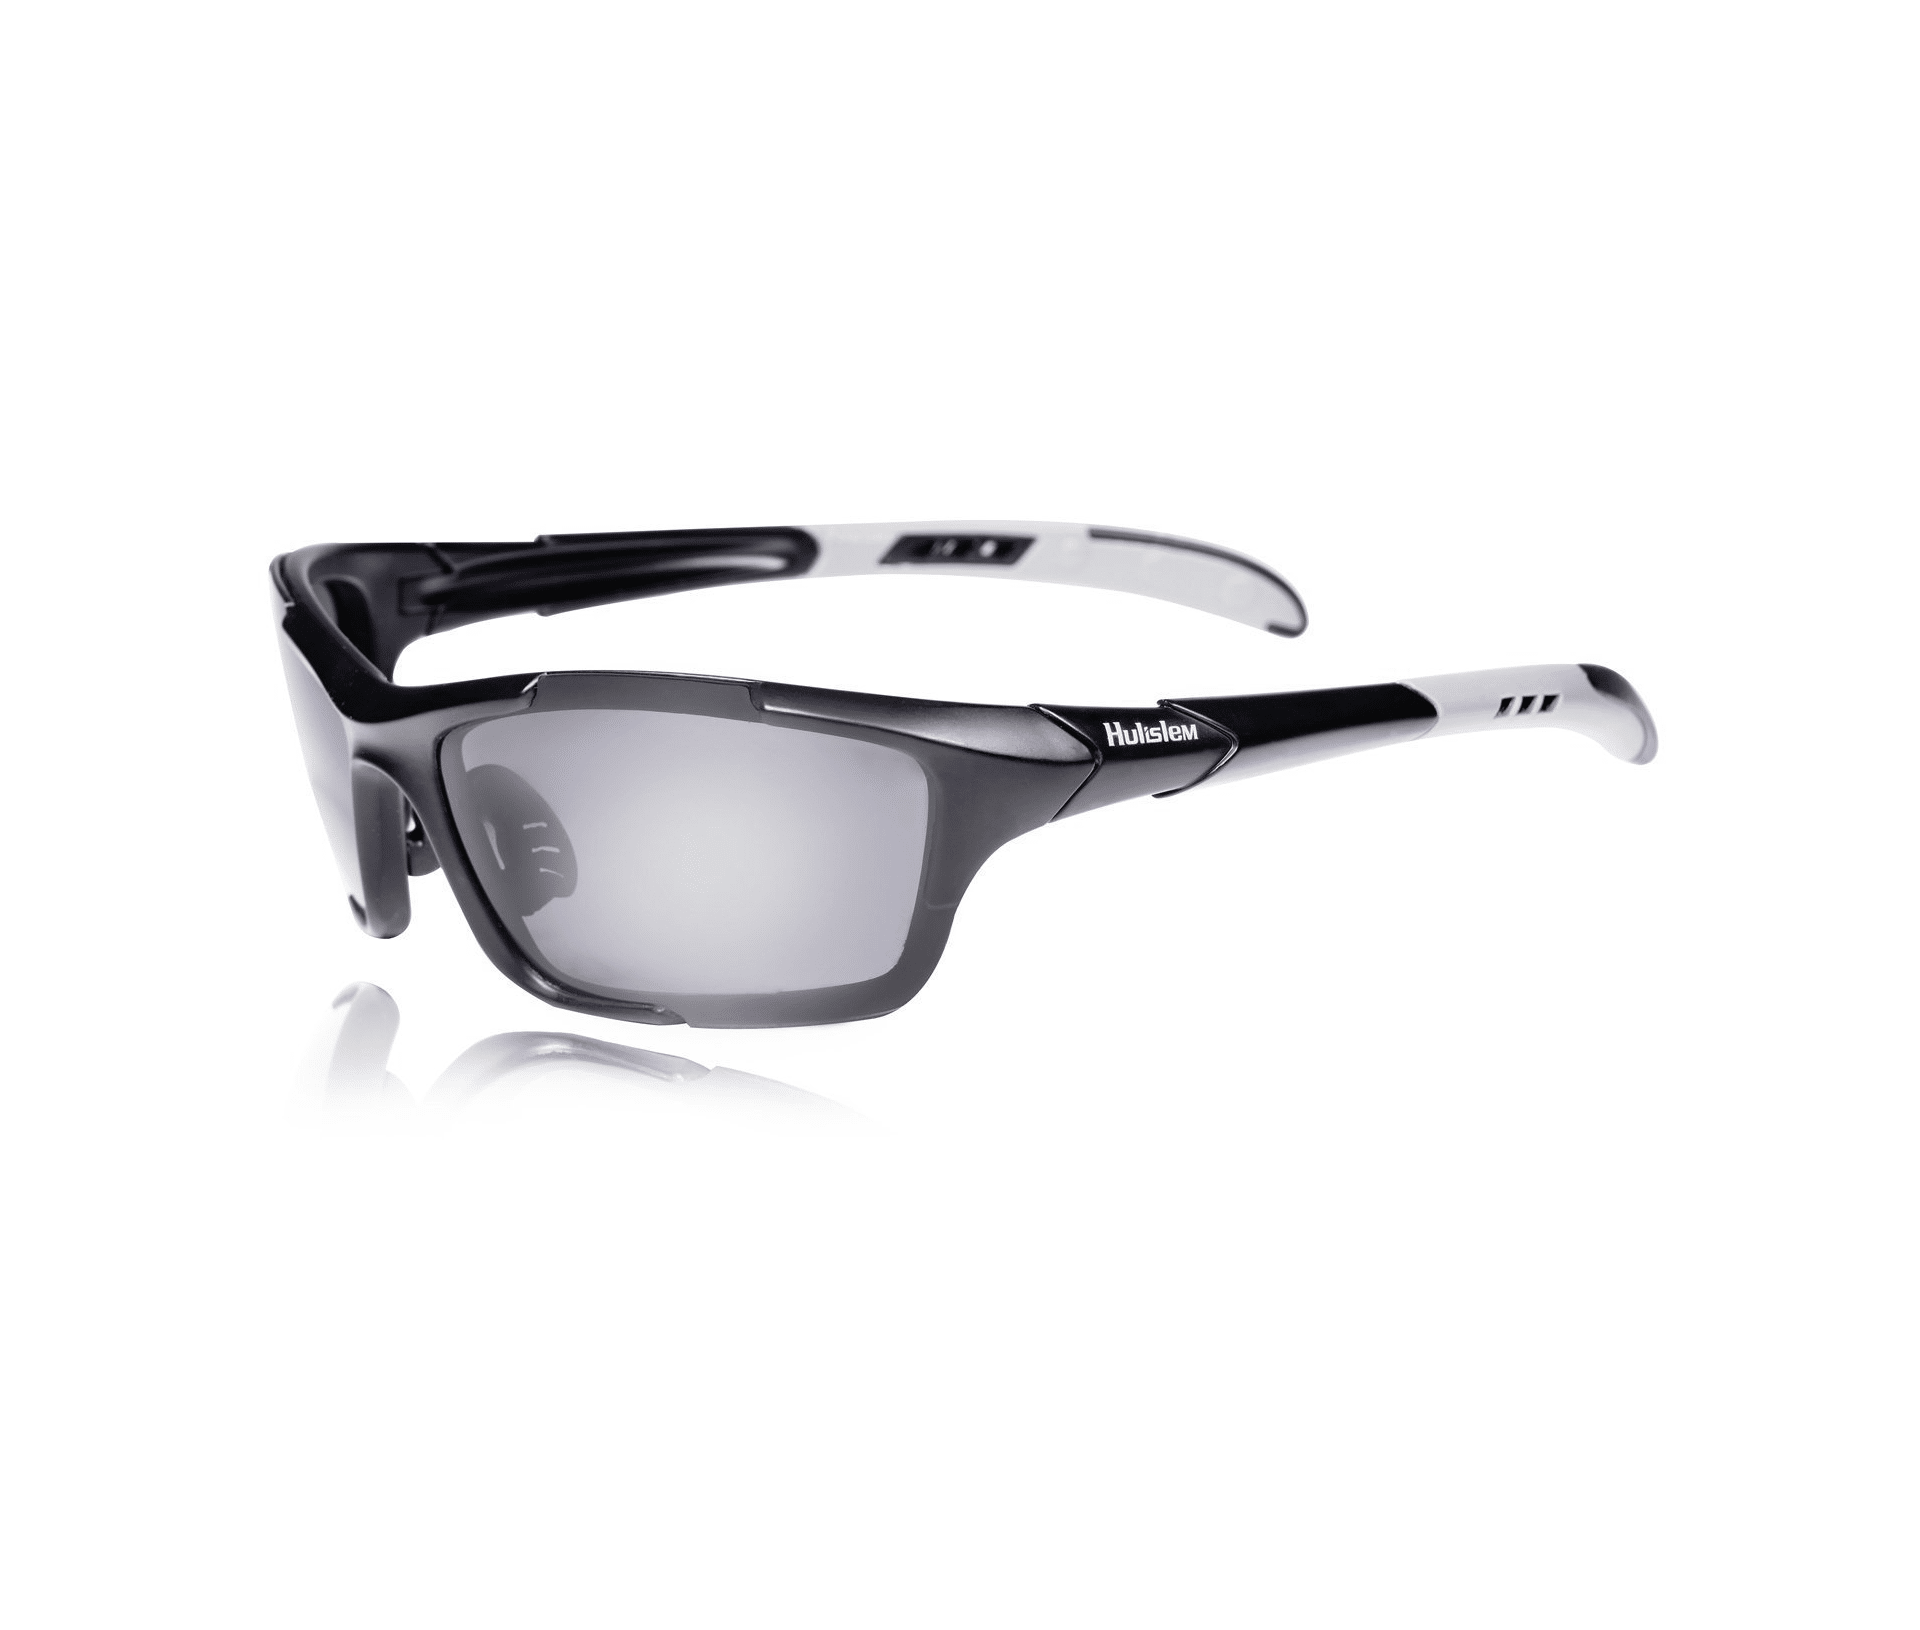 Hulislem S1 Sport Polarized Golf Sunglasses